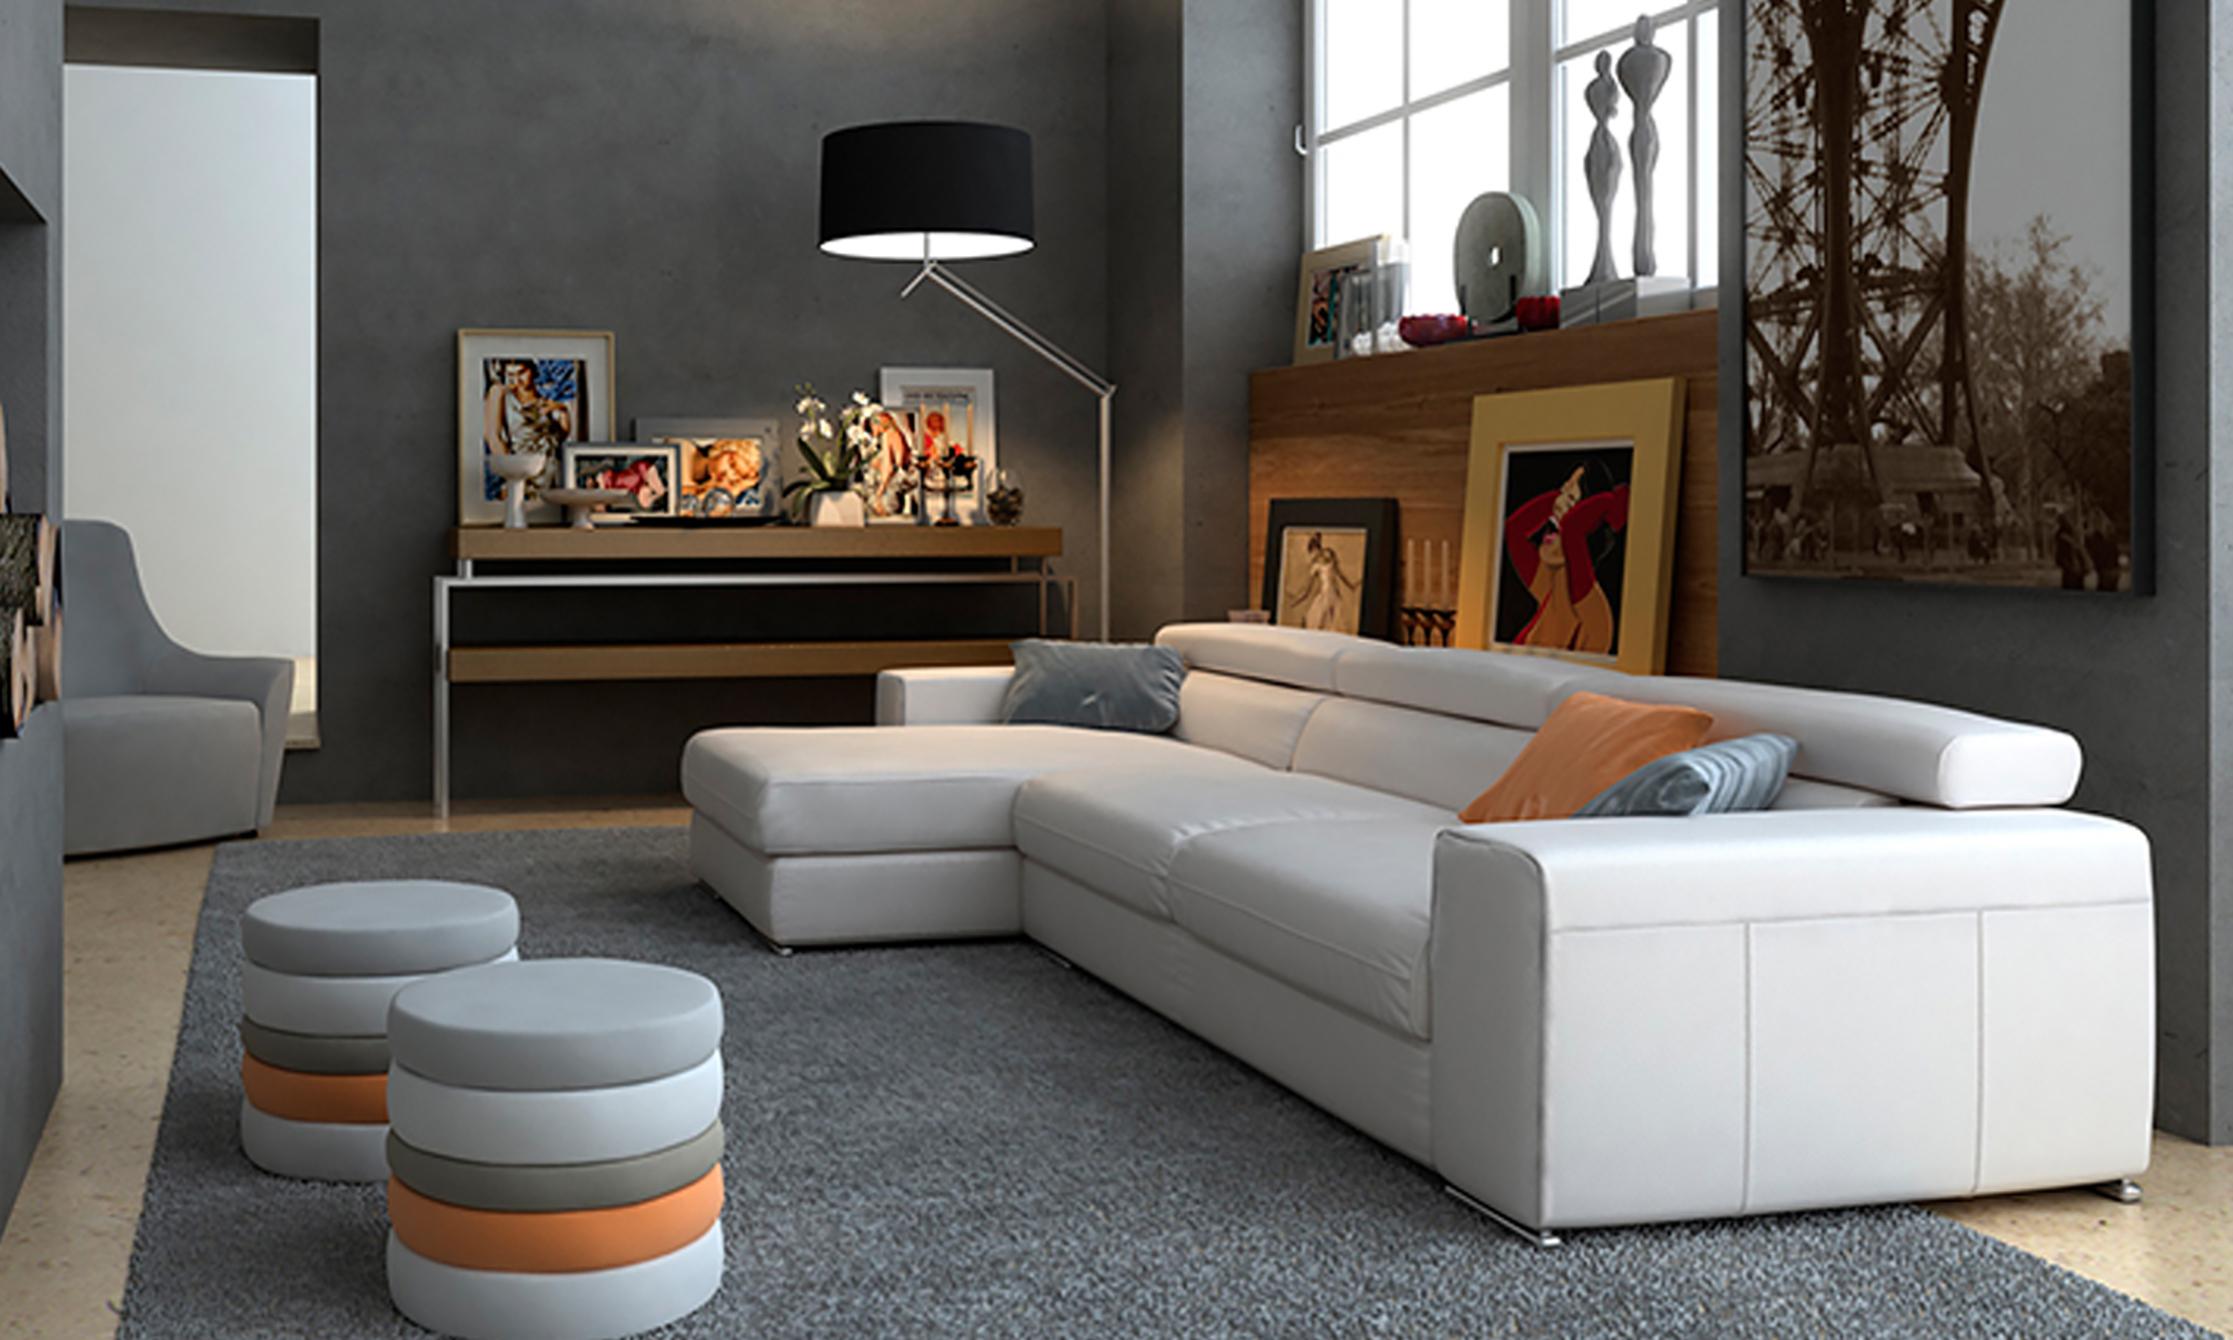 sofá bassico avvento